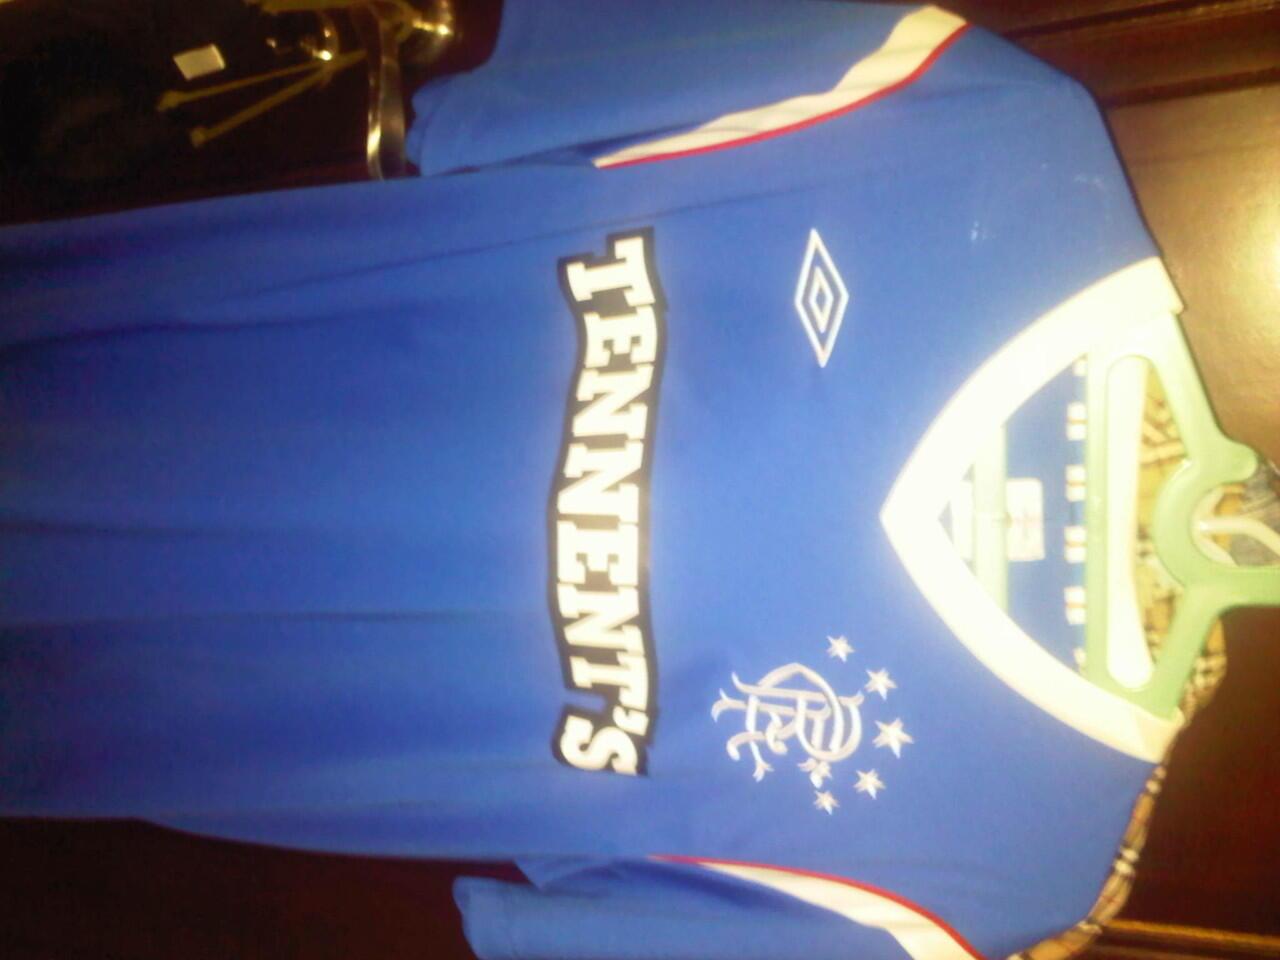 [WTS] Jersey Glasgow Rangers 11/12 sz. L Europe/ XL Asia